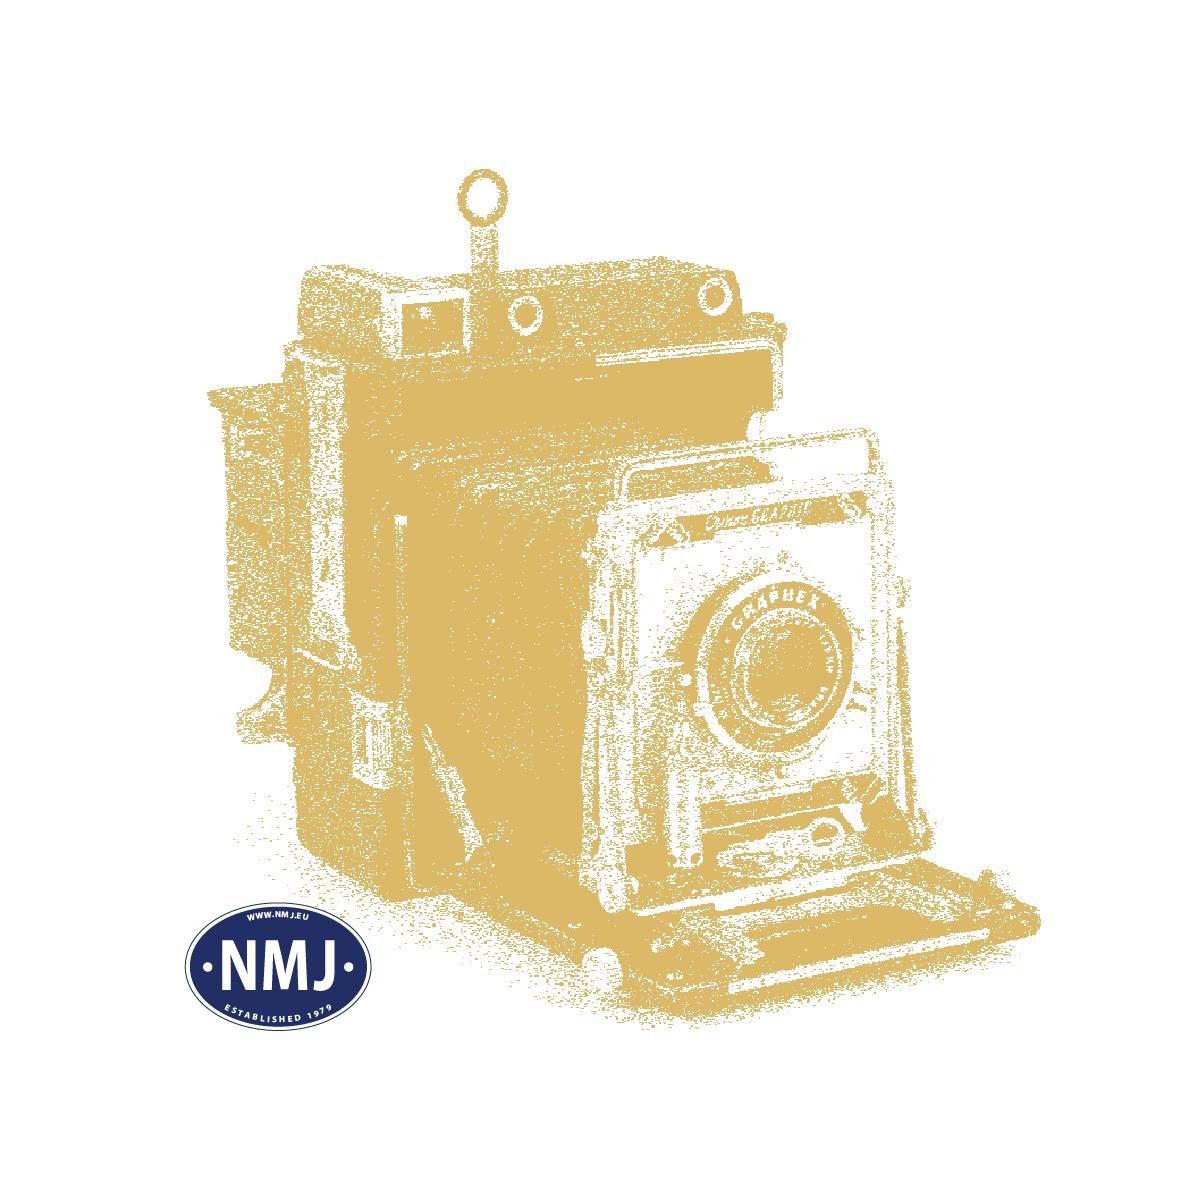 NMJT81.993 - NMJ Topline NSB BM71/73 Beleuchtungsset, 3 teilig